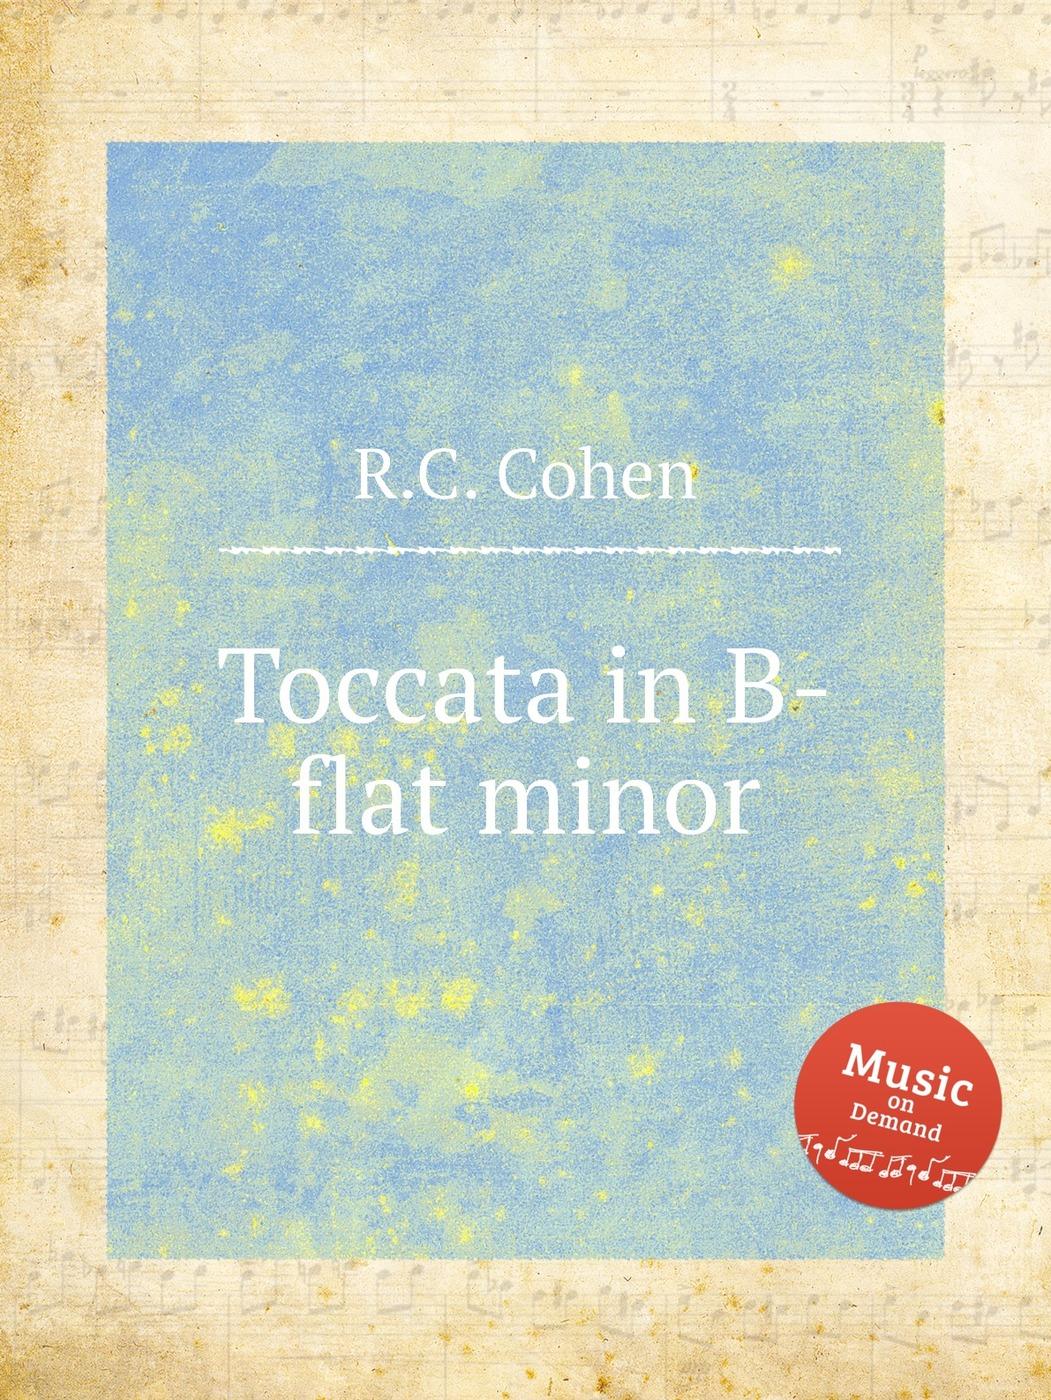 Toccata in B-flat minor